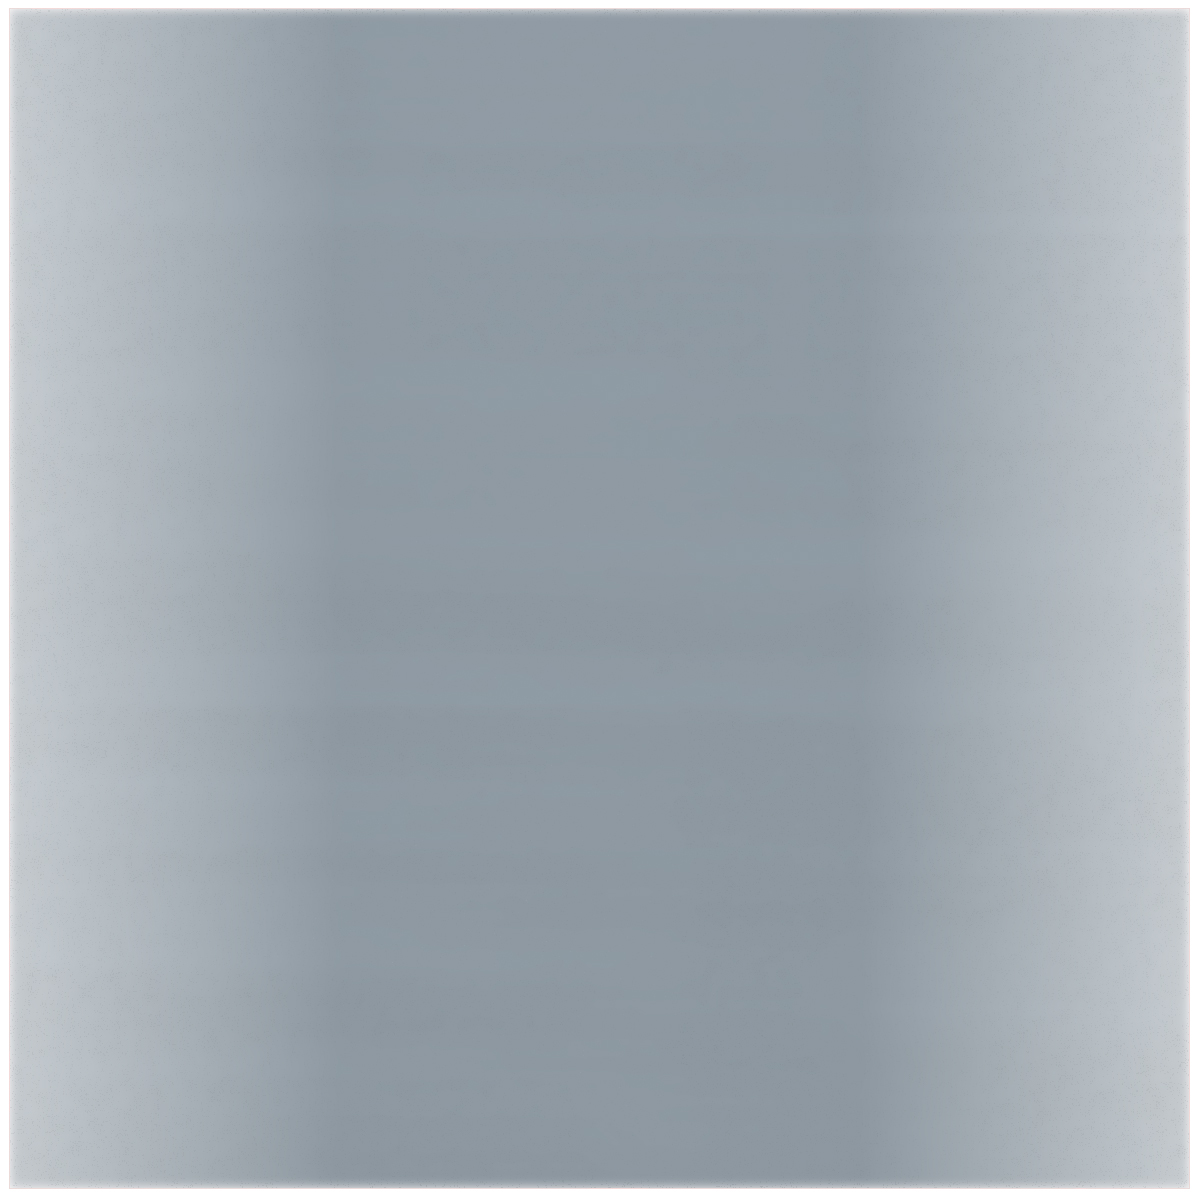 Foil Cardstock Silver Matte 12X12